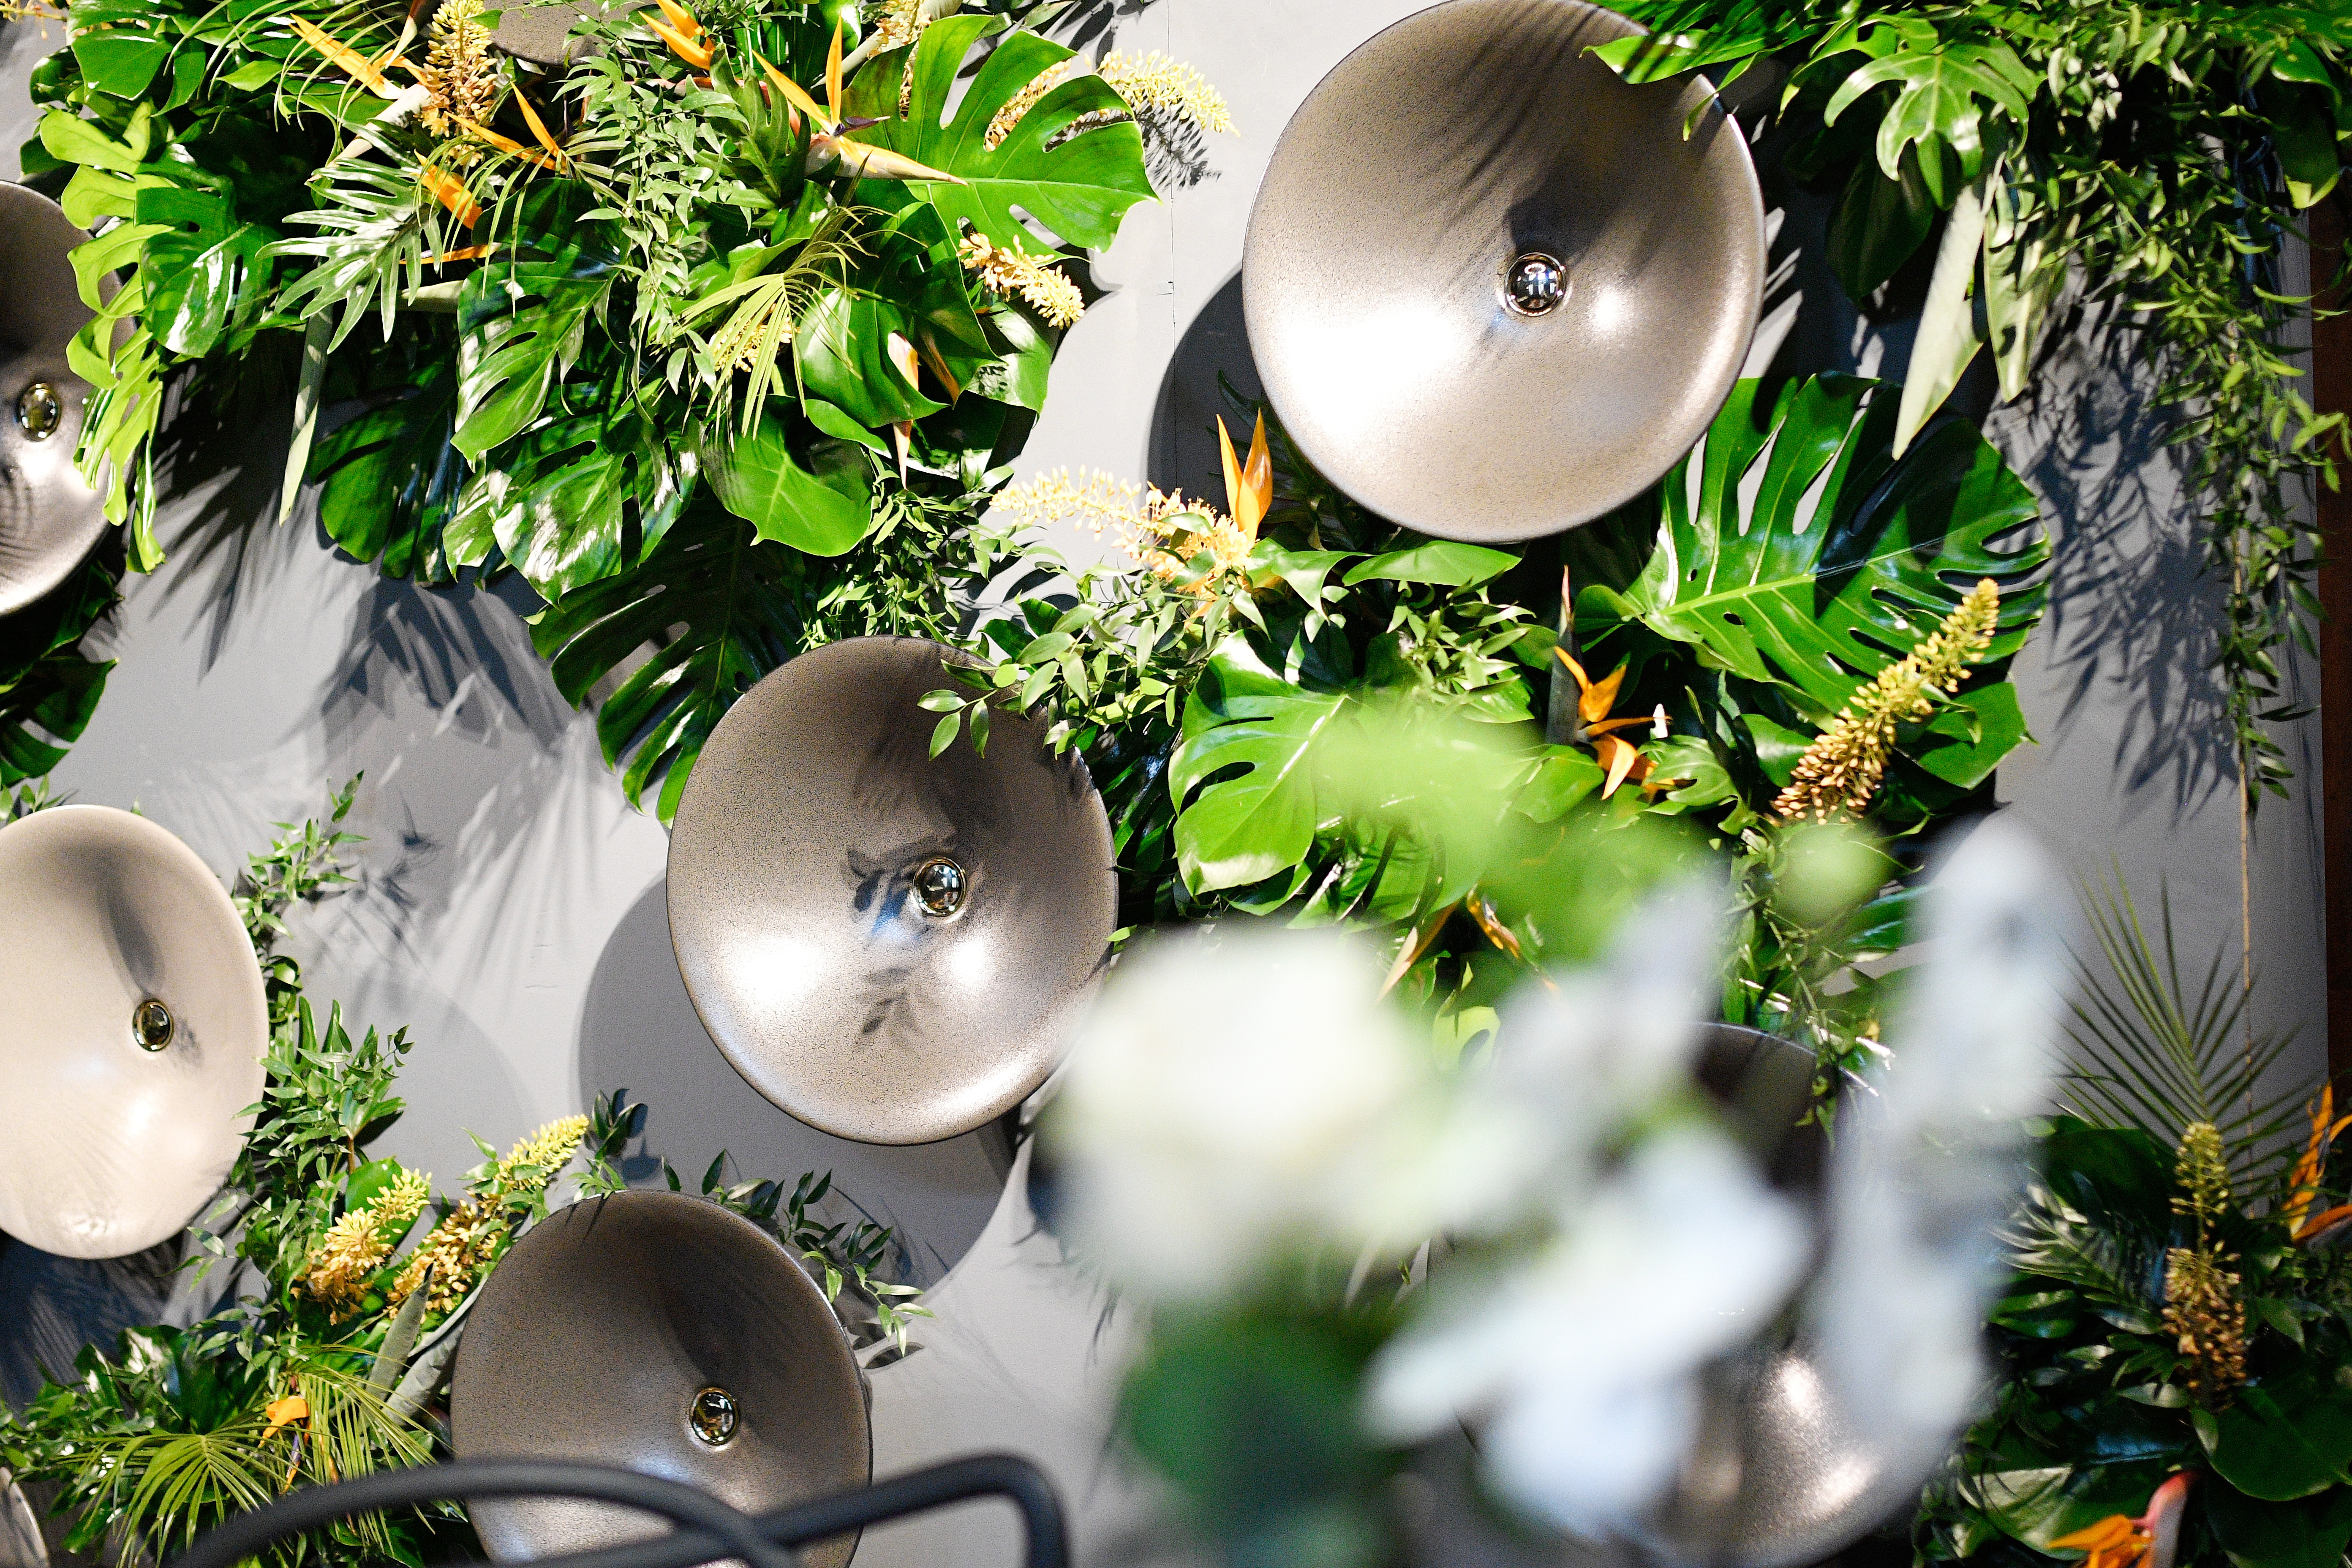 Kohler showcases Shagreen sinks during Milan Design Week (Photo: Business Wire)